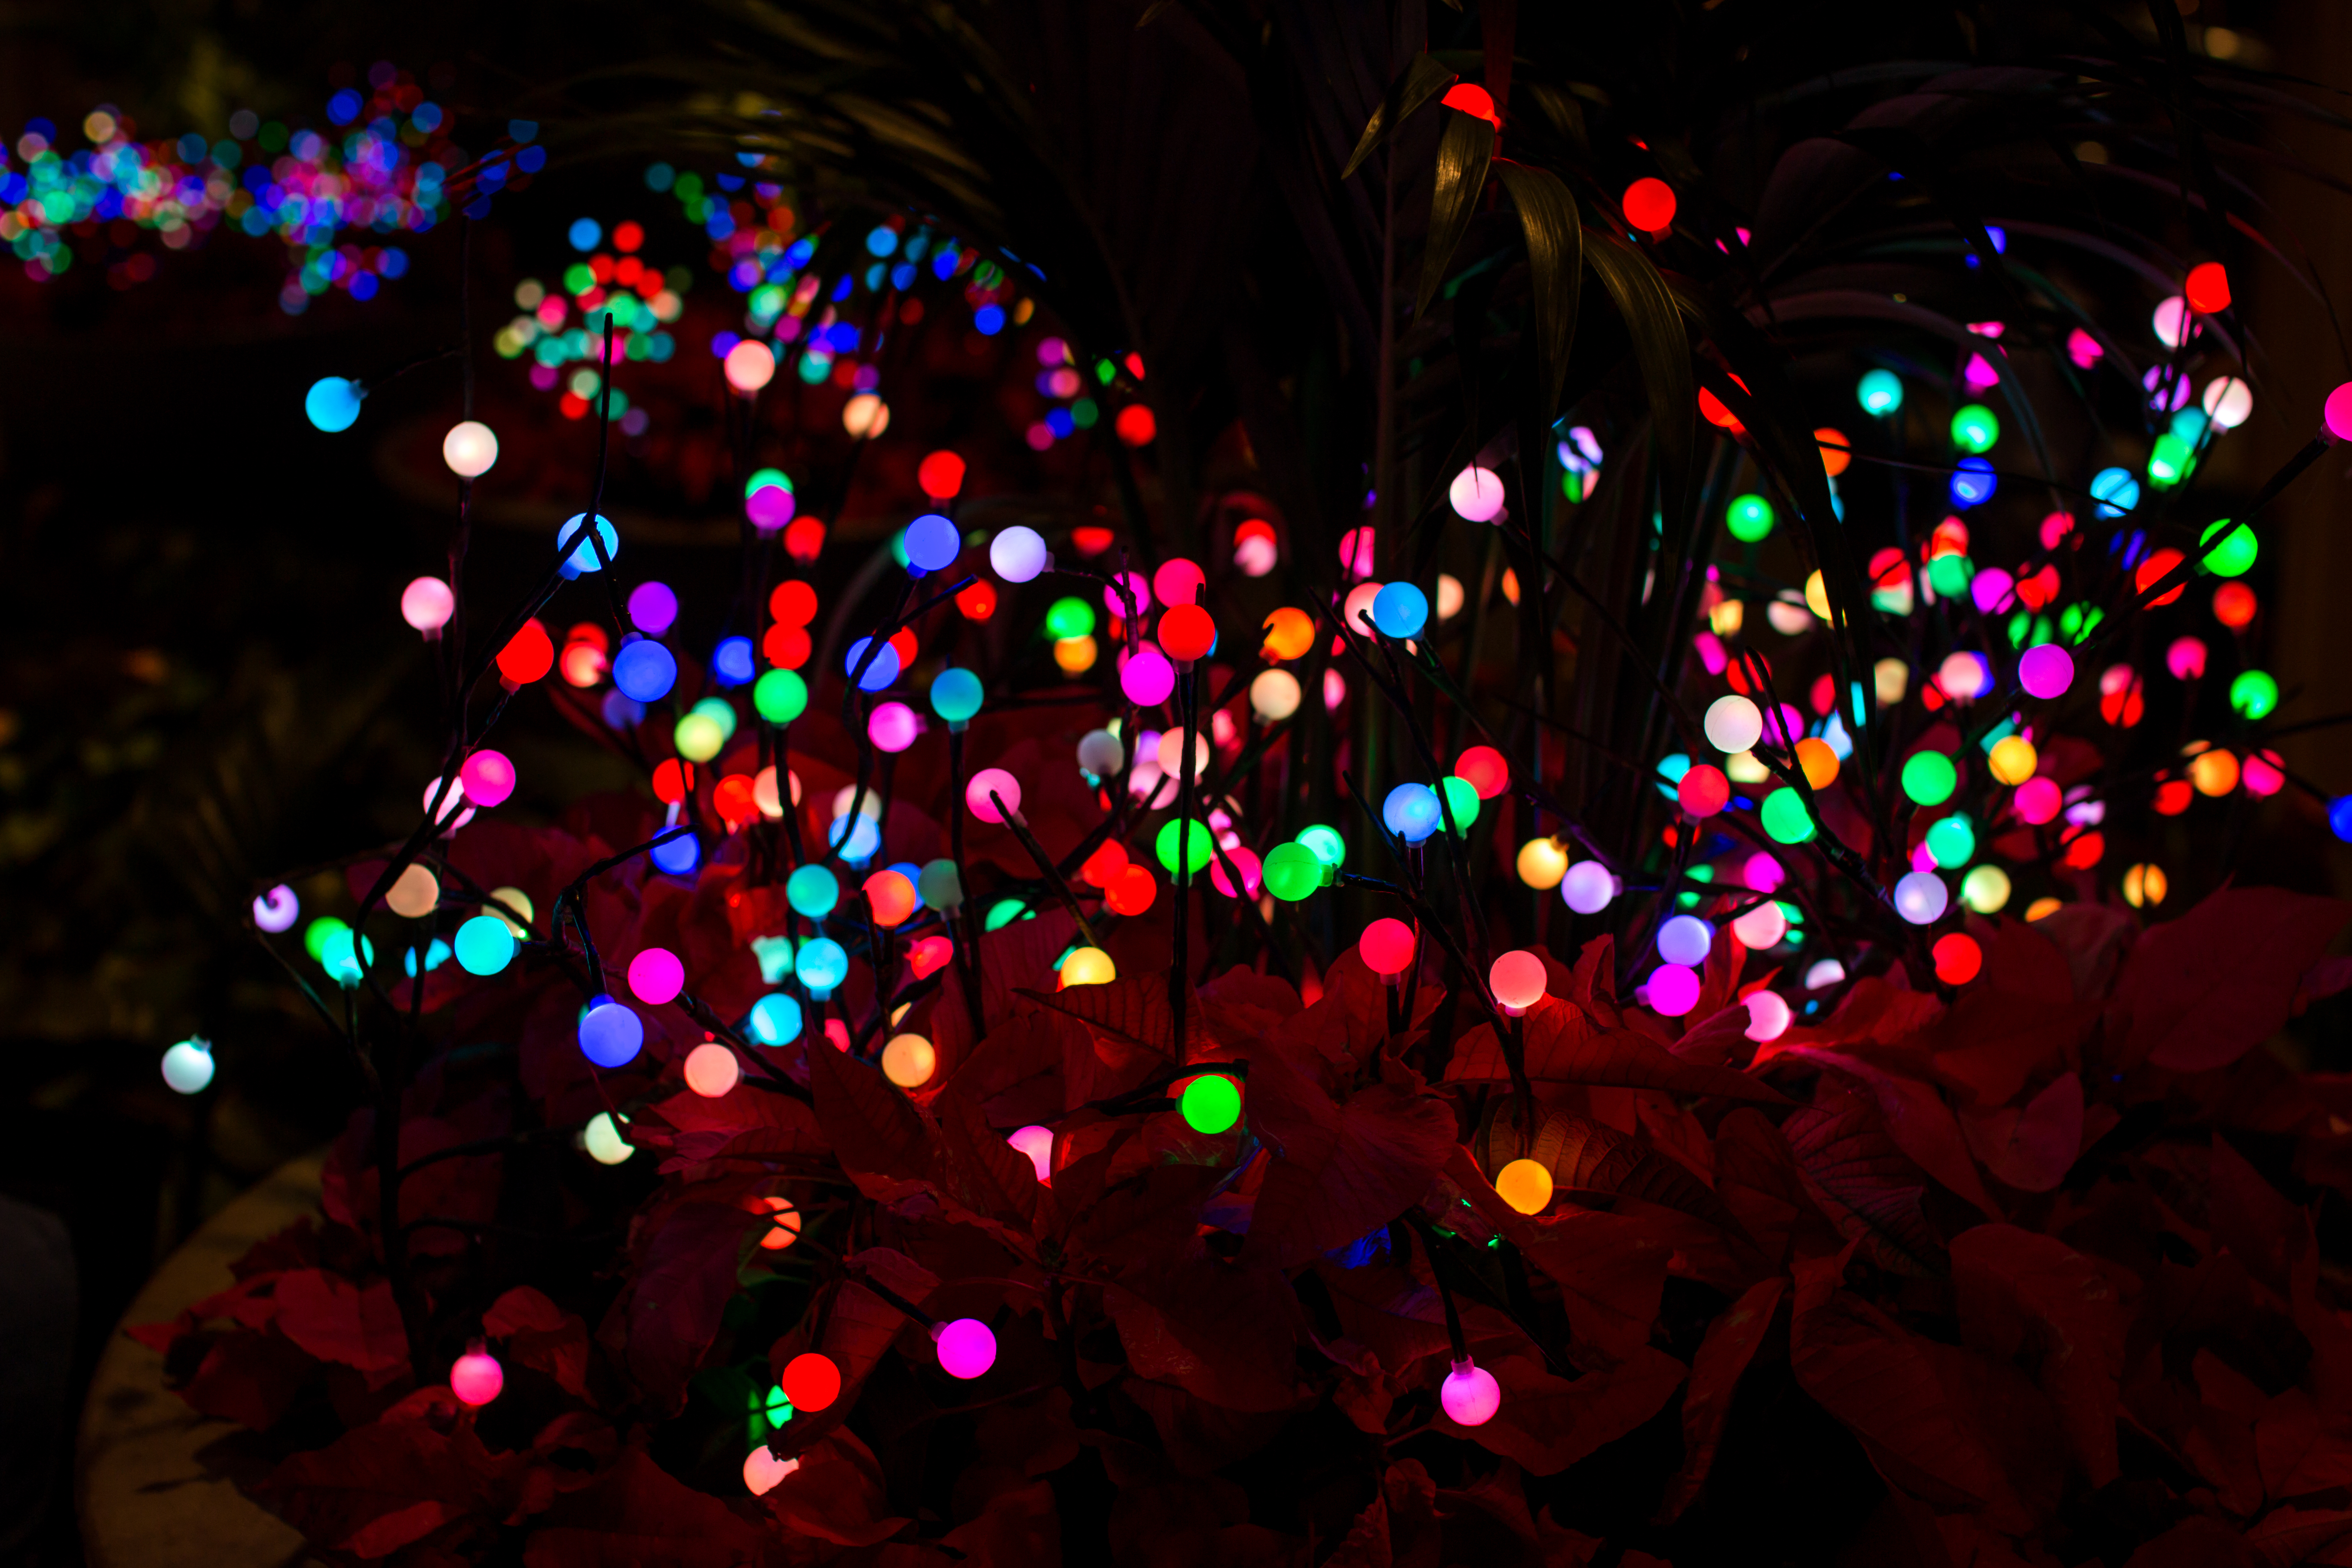 filechristmas at disneyland hotel 28244222726jpg - Disneyland Christmas Dates